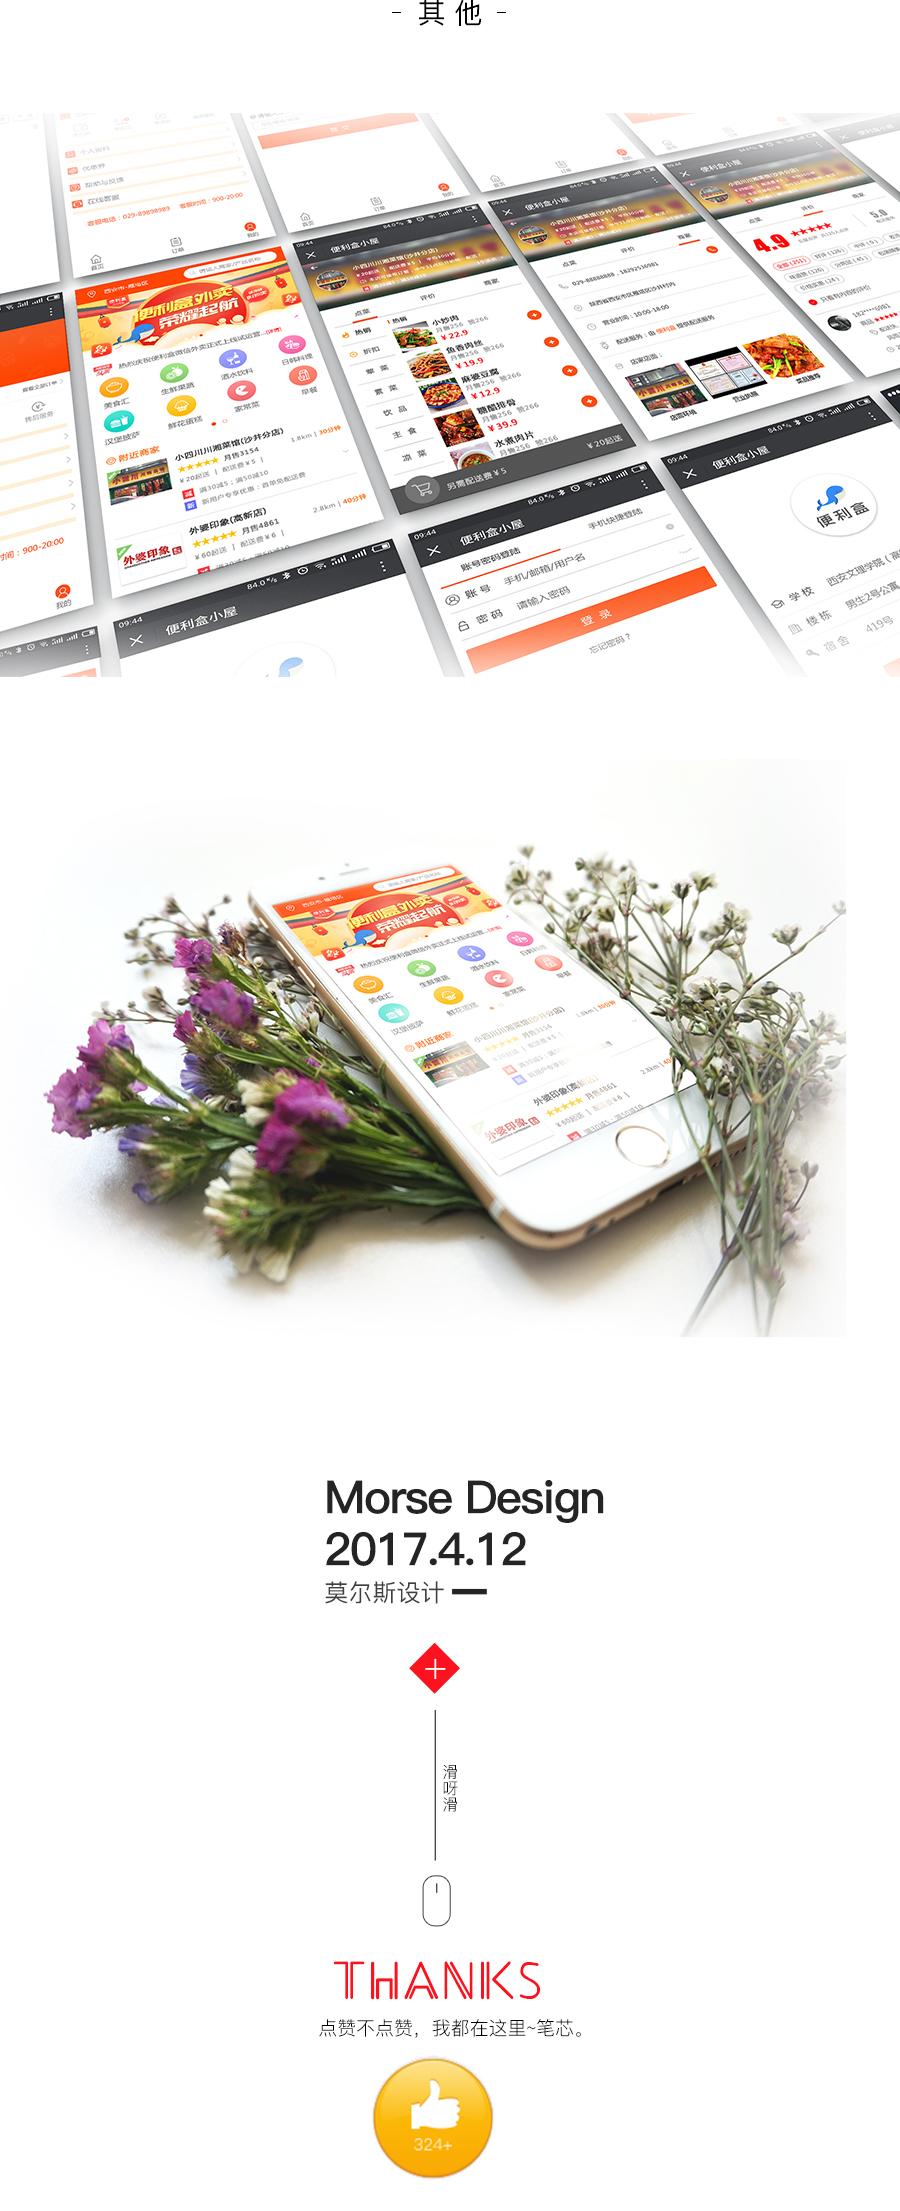 【Morse design】微信外卖商城GUI